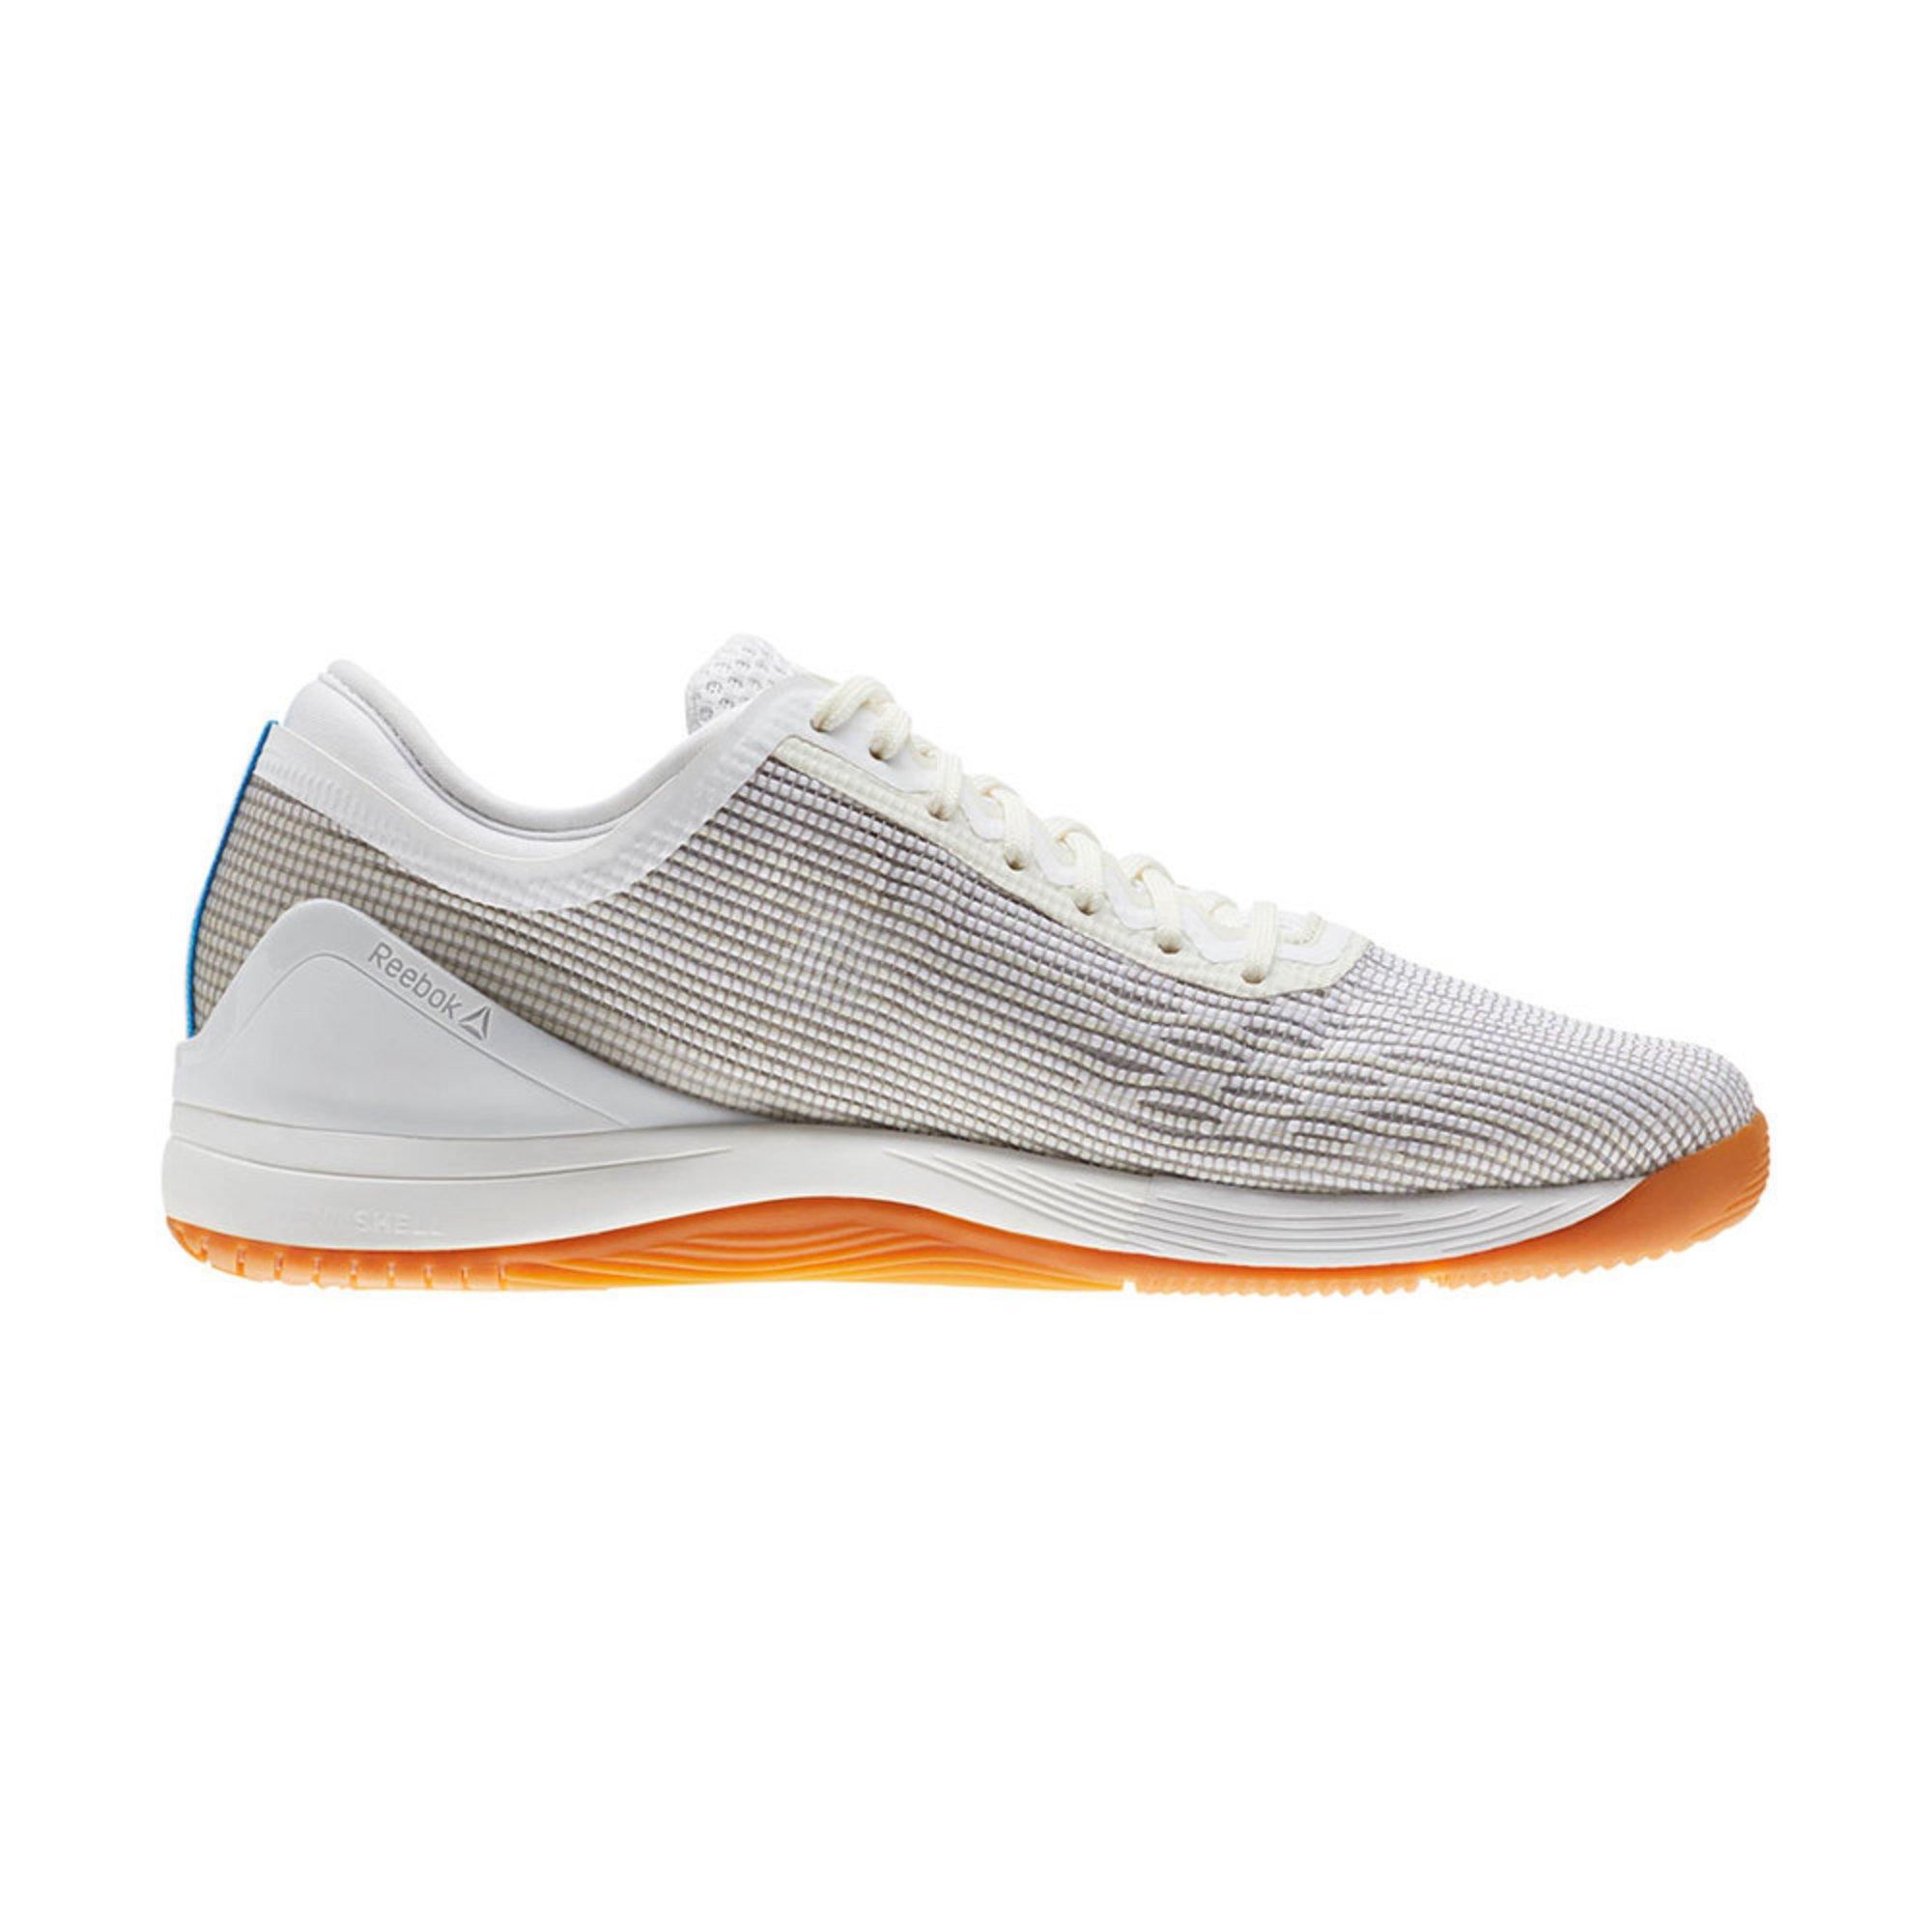 b83764cac5b642 Reebok Women s Crossfit Nano 8.0 Crossfit Shoe